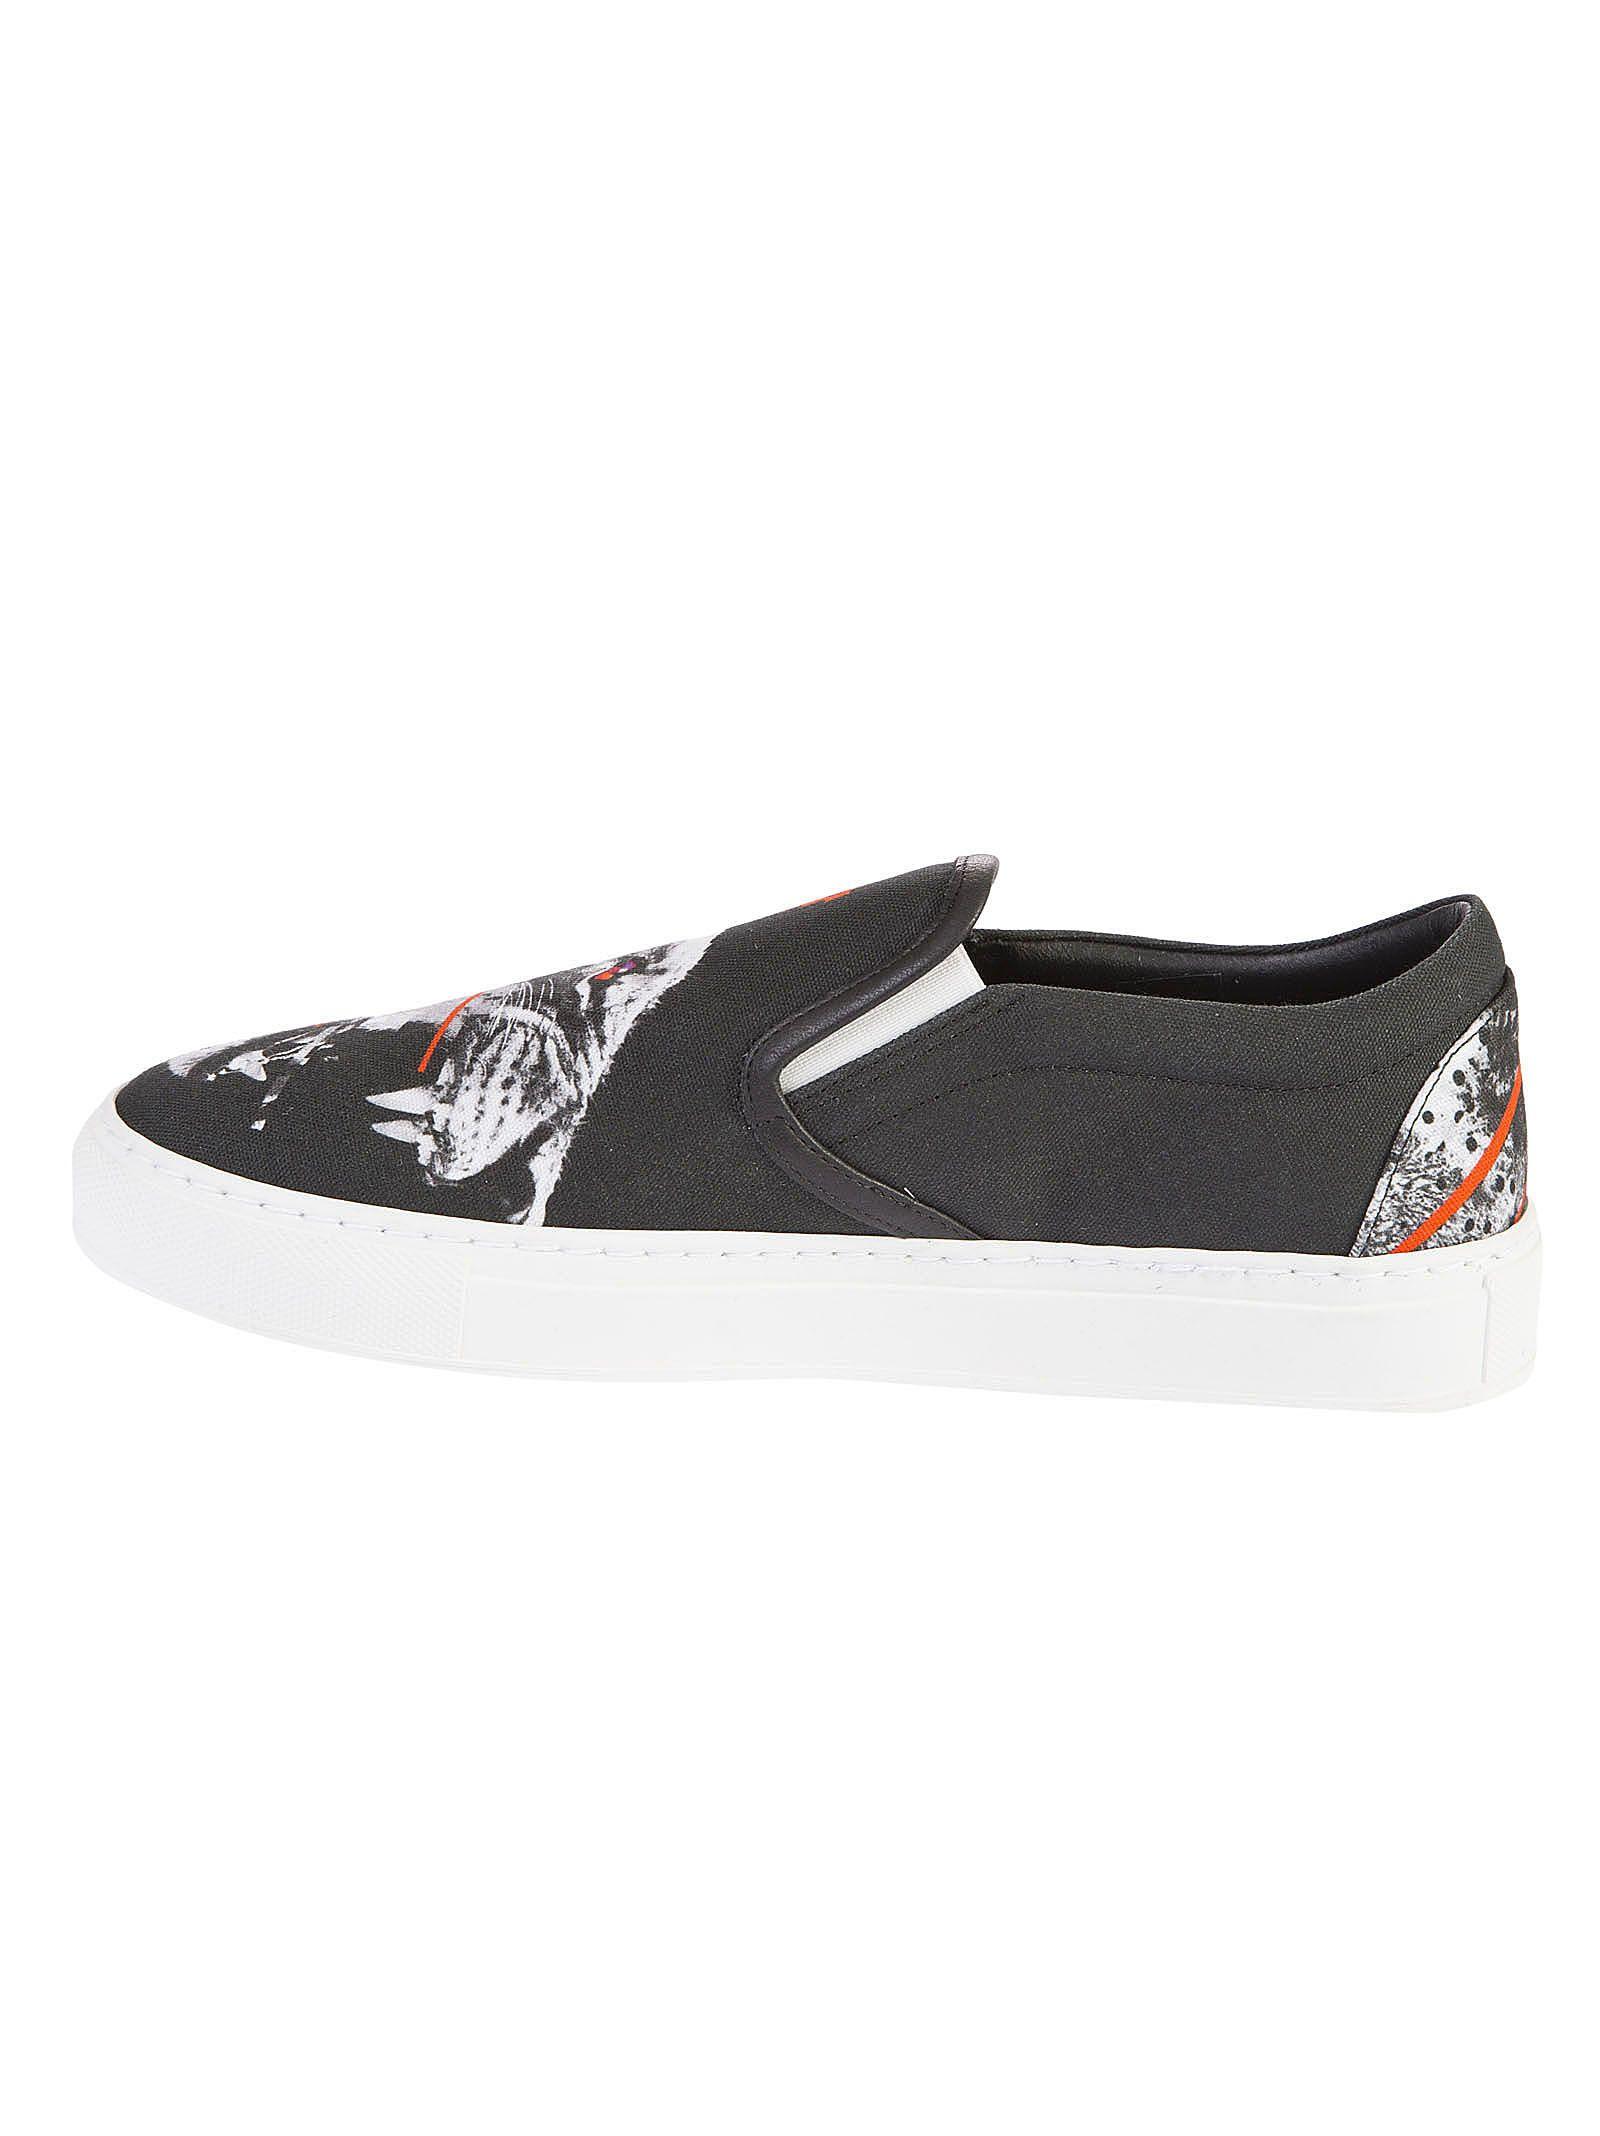 Marcelo Burlon Printed Slip-on Sneakers